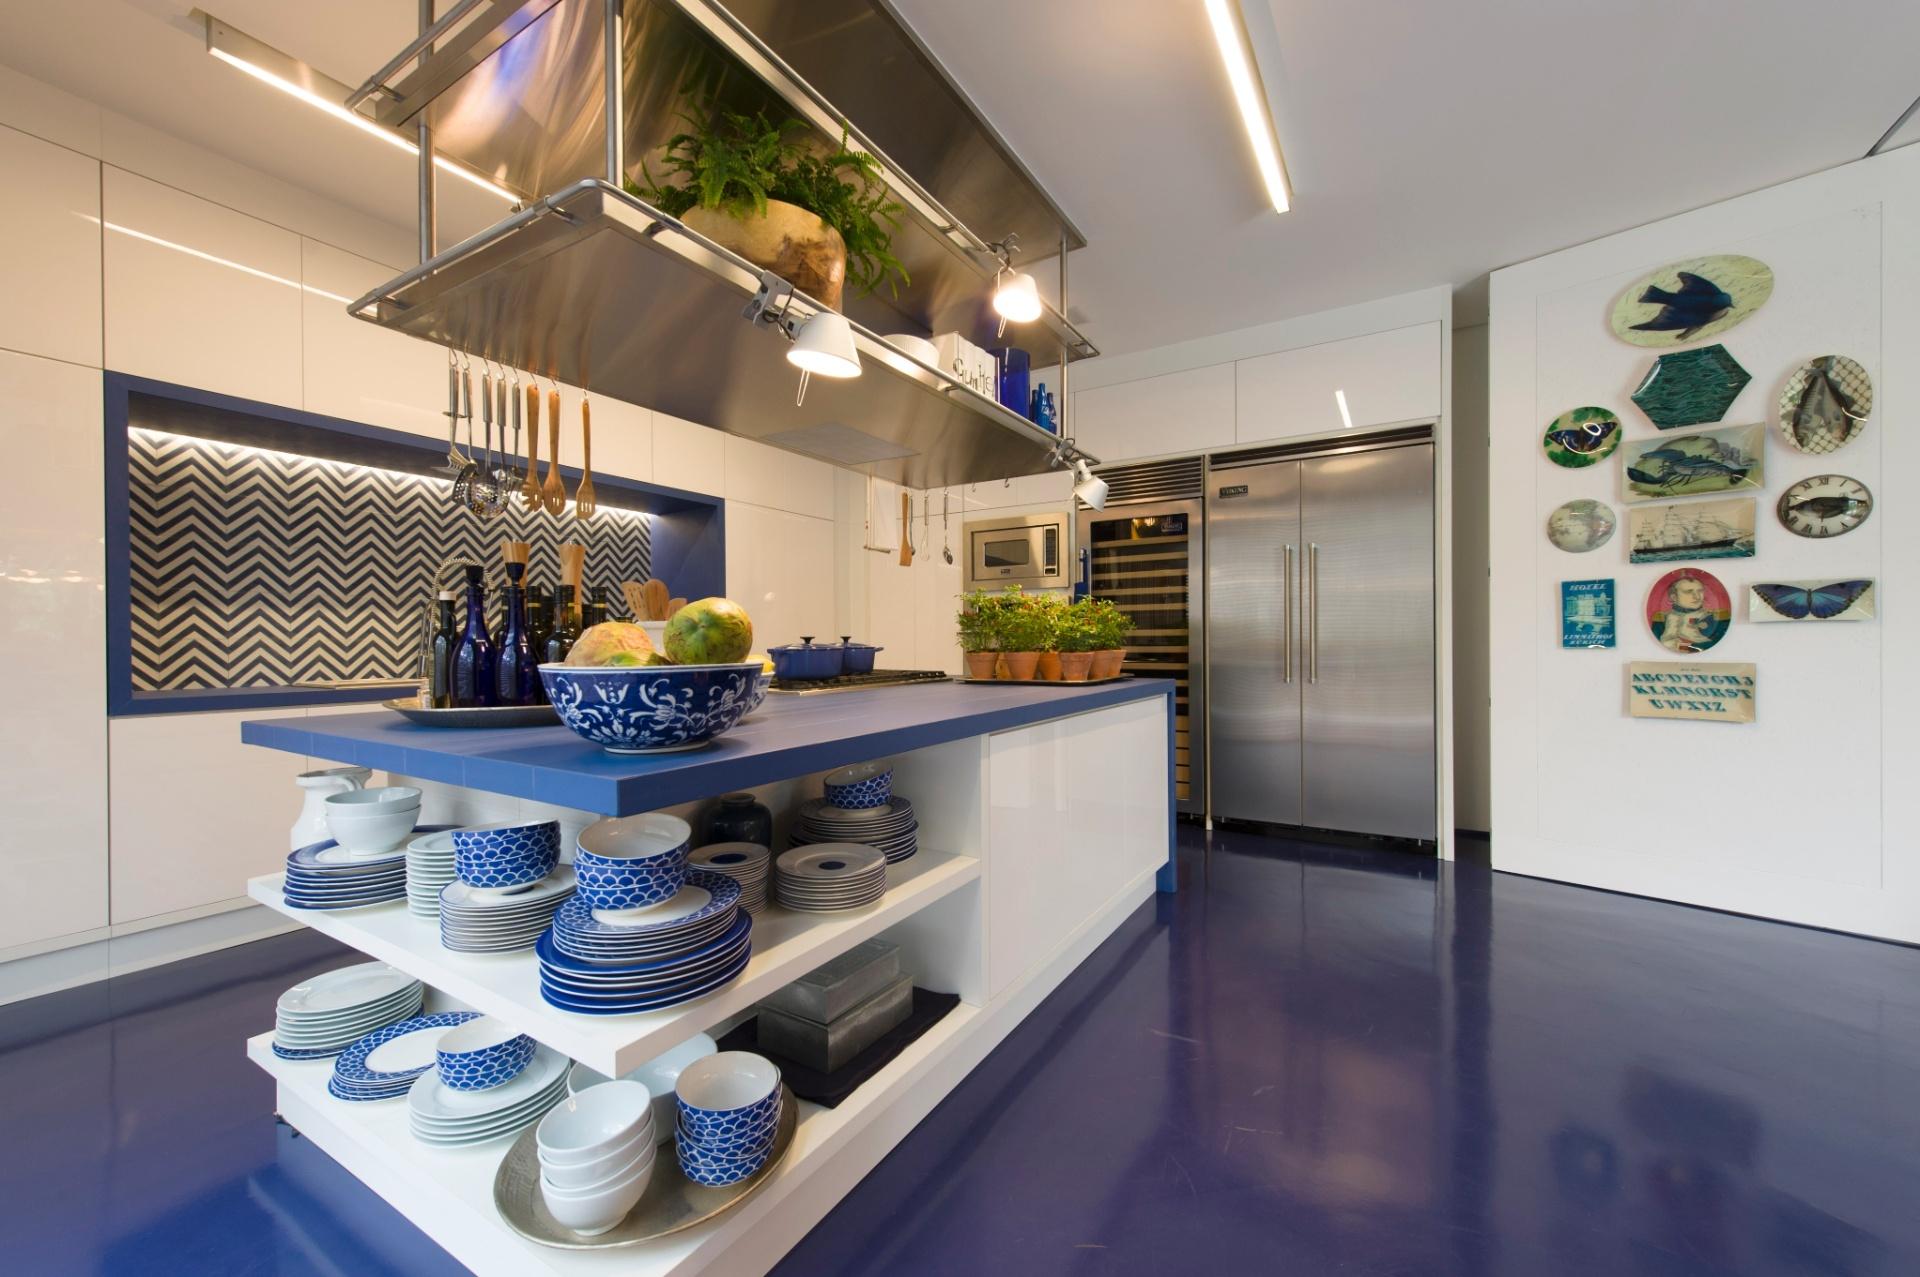 A Casa de Praia idealizada por Roberto Migotto, tem o azul